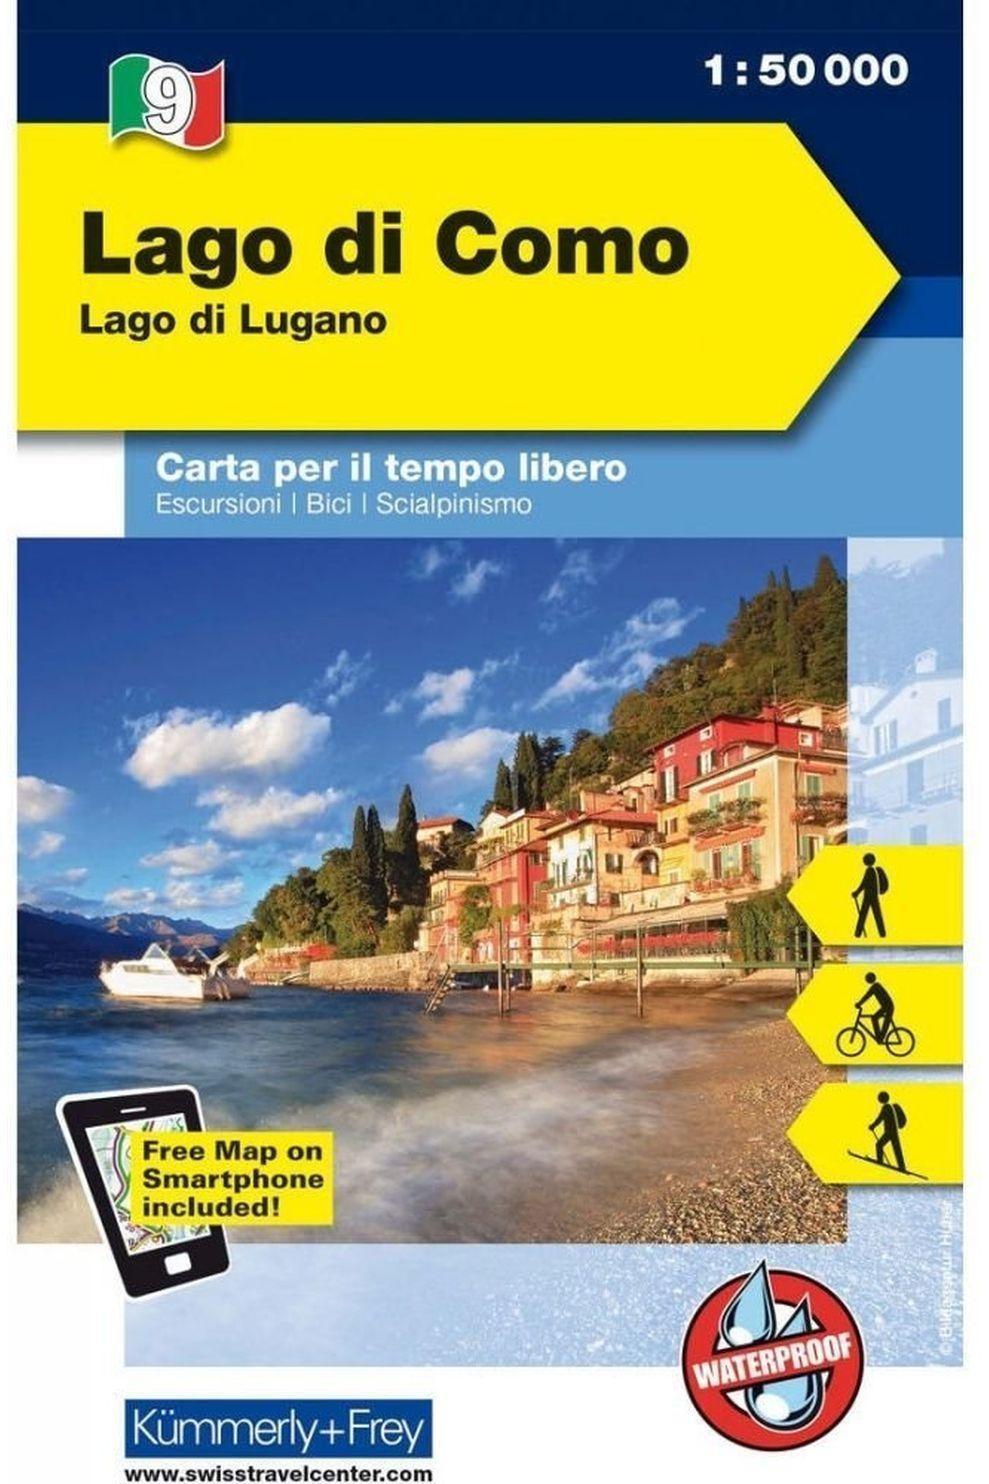 K&F Lago Di Como 9 Lago Di Lugano K&F R/V Wp - 9022